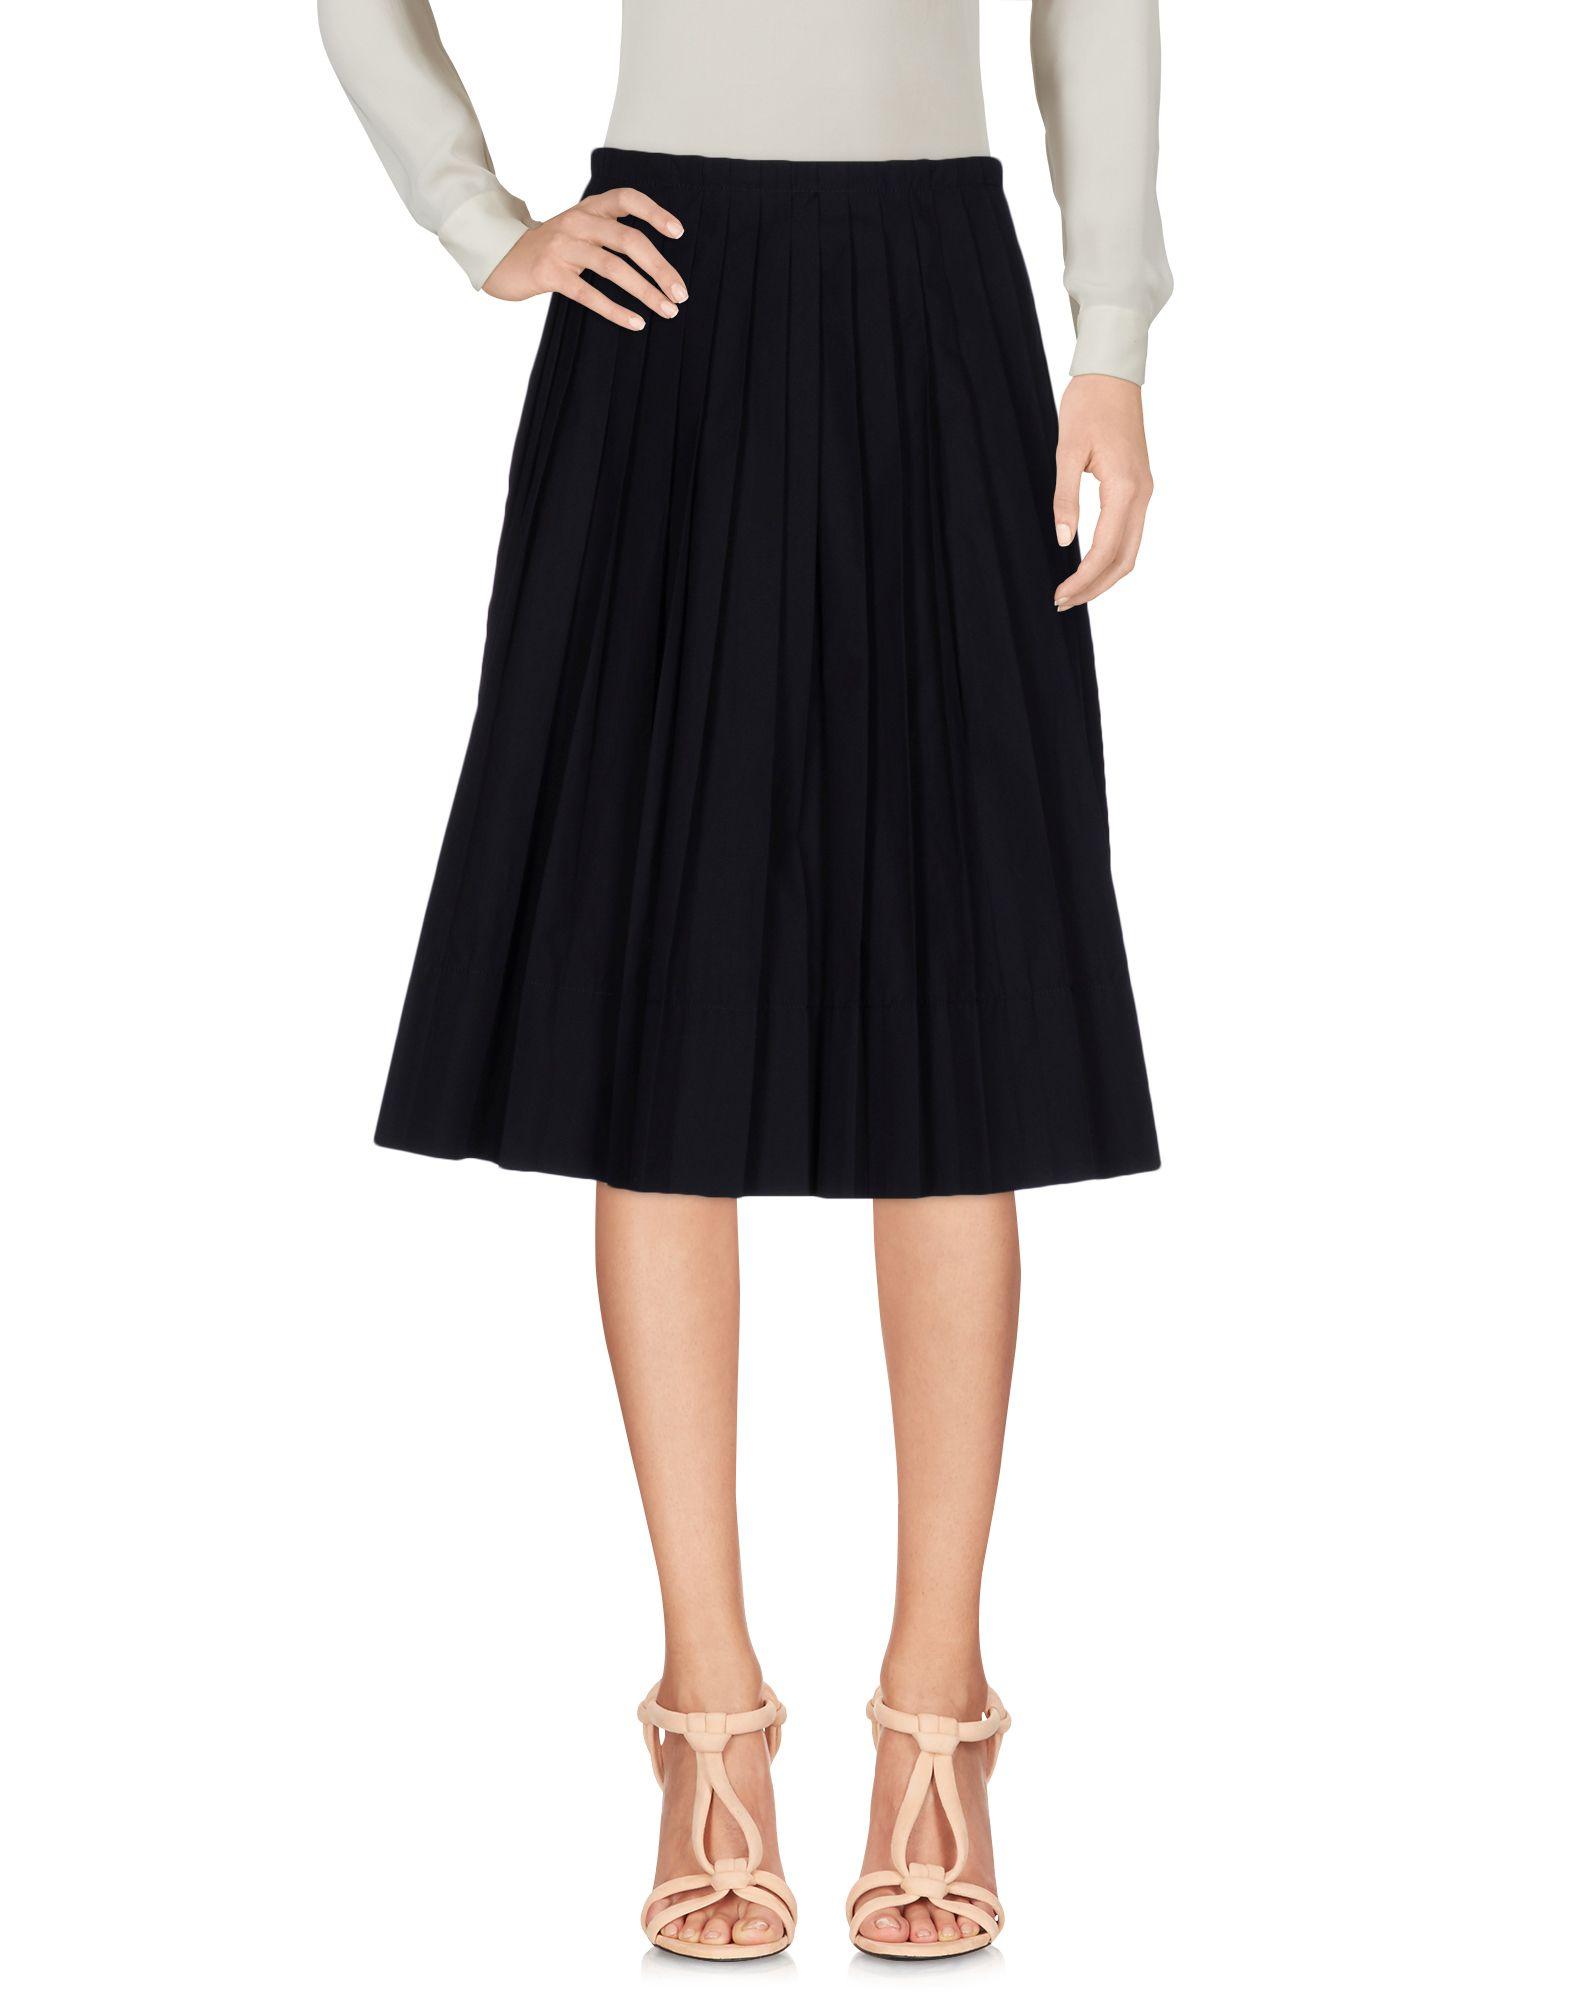 IO IVANA OMAZIC Knee Length Skirts in Dark Blue